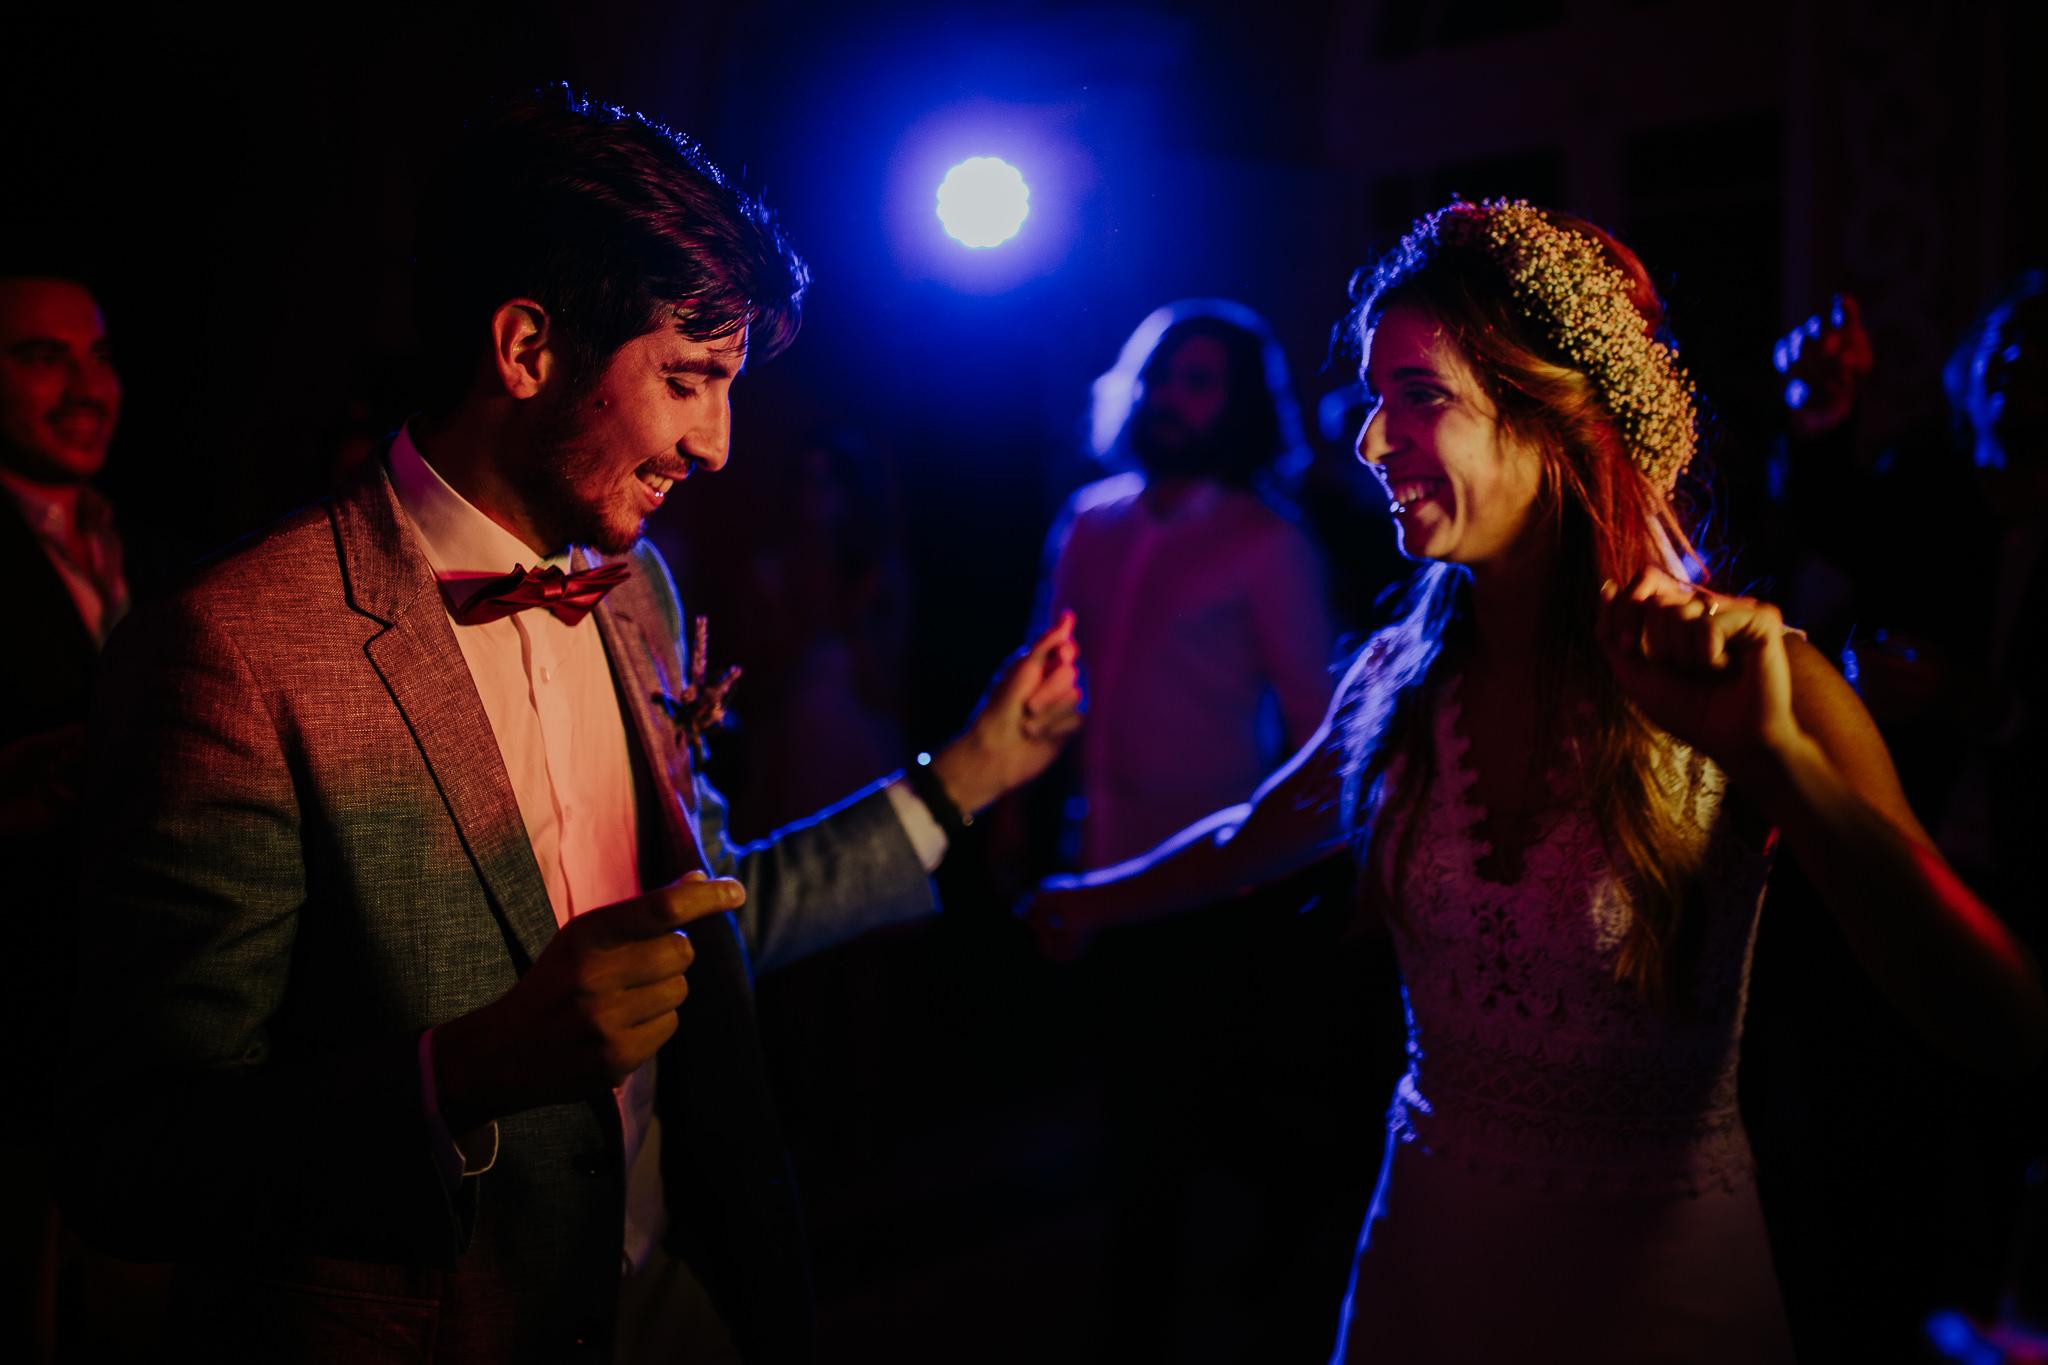 romina_thomas_destination_wedding_photography_fotografia_de_casamento_lisbon_sintra_penha_longa_resort-30